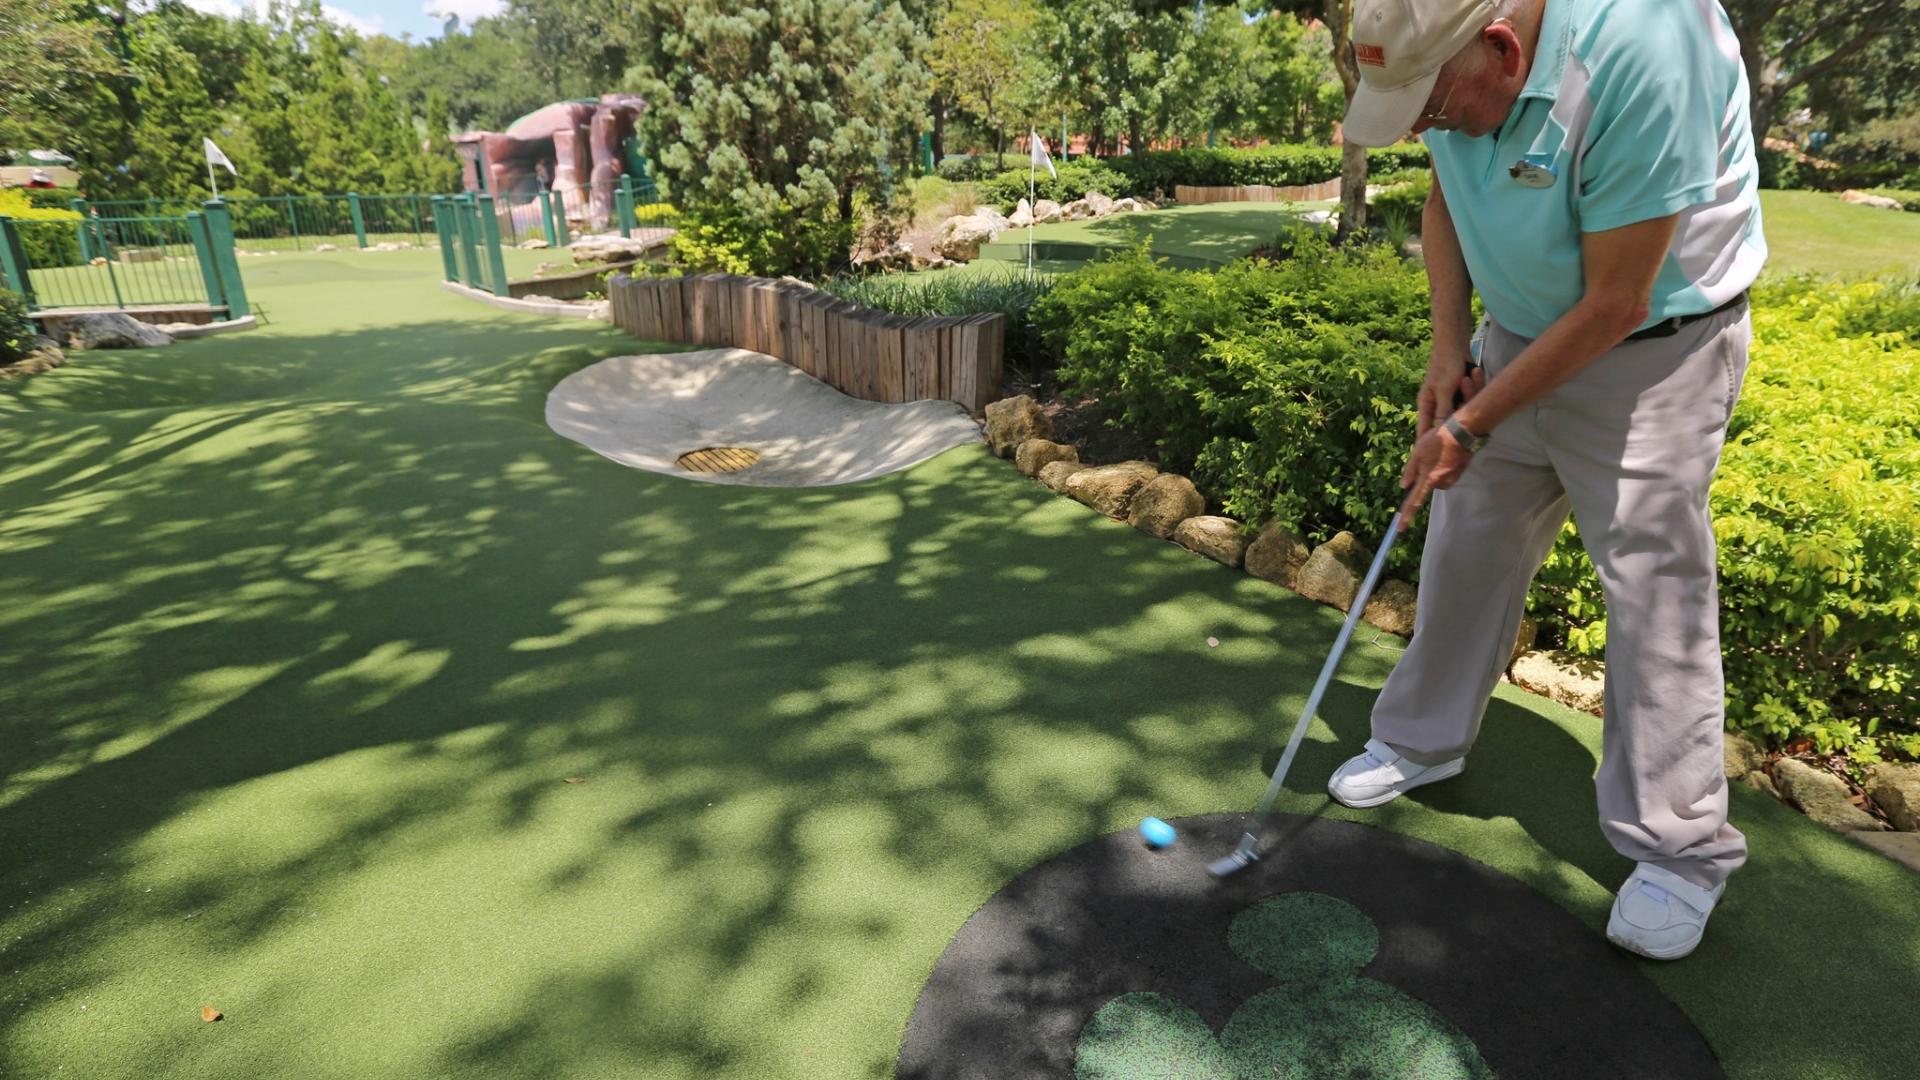 Lakeland Man Plays Walt Disney World Mini Golf Course 564 Times Orlando Sentinel